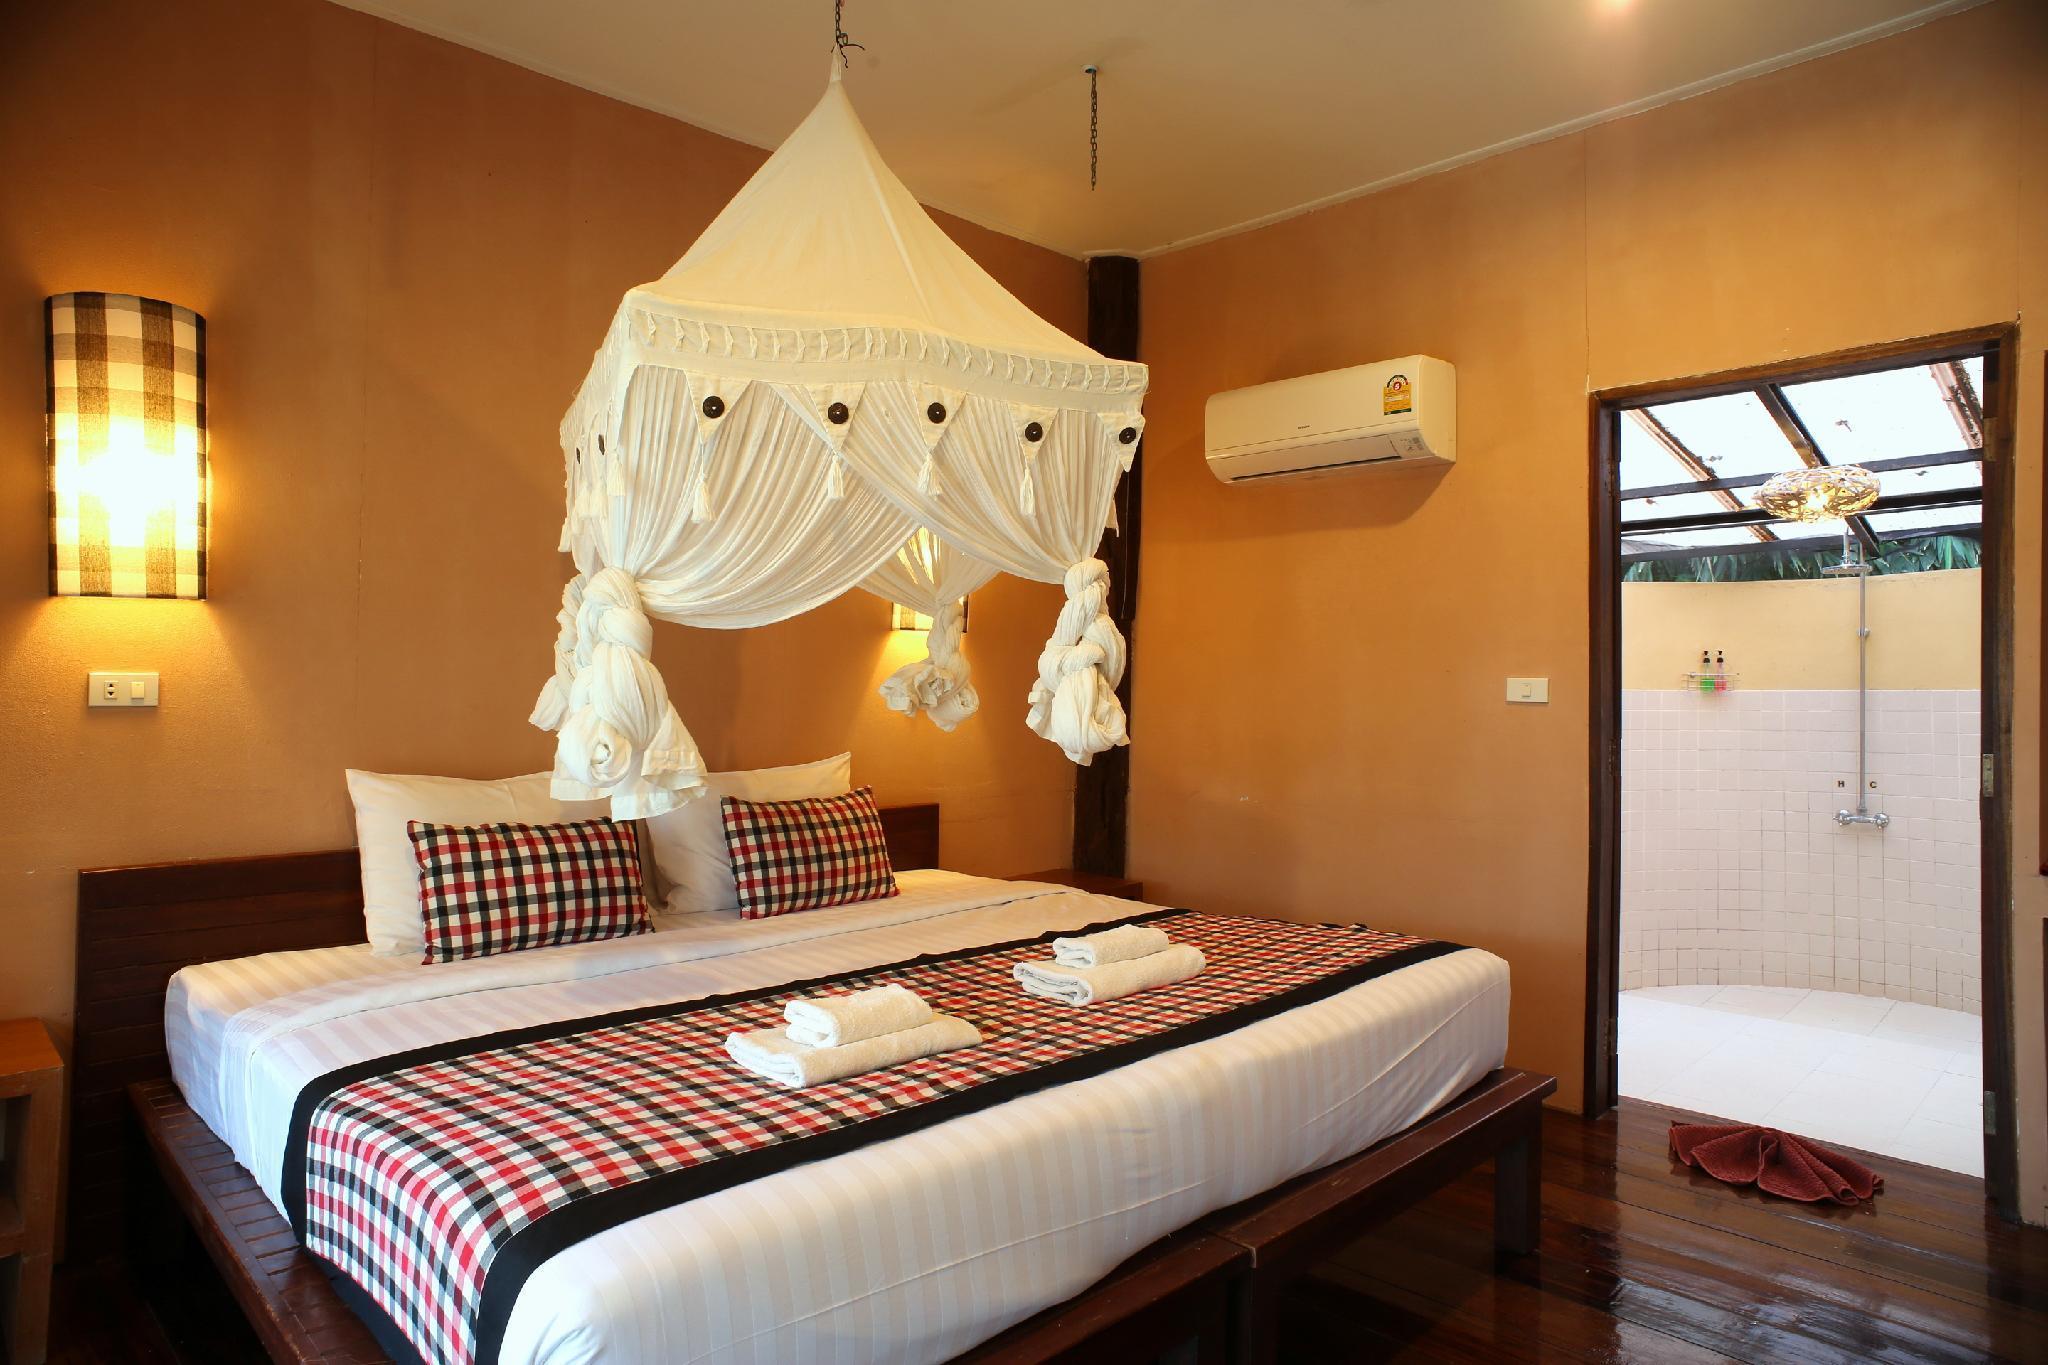 Thapwarin Resort ทับวารินทร์ รีสอร์ท